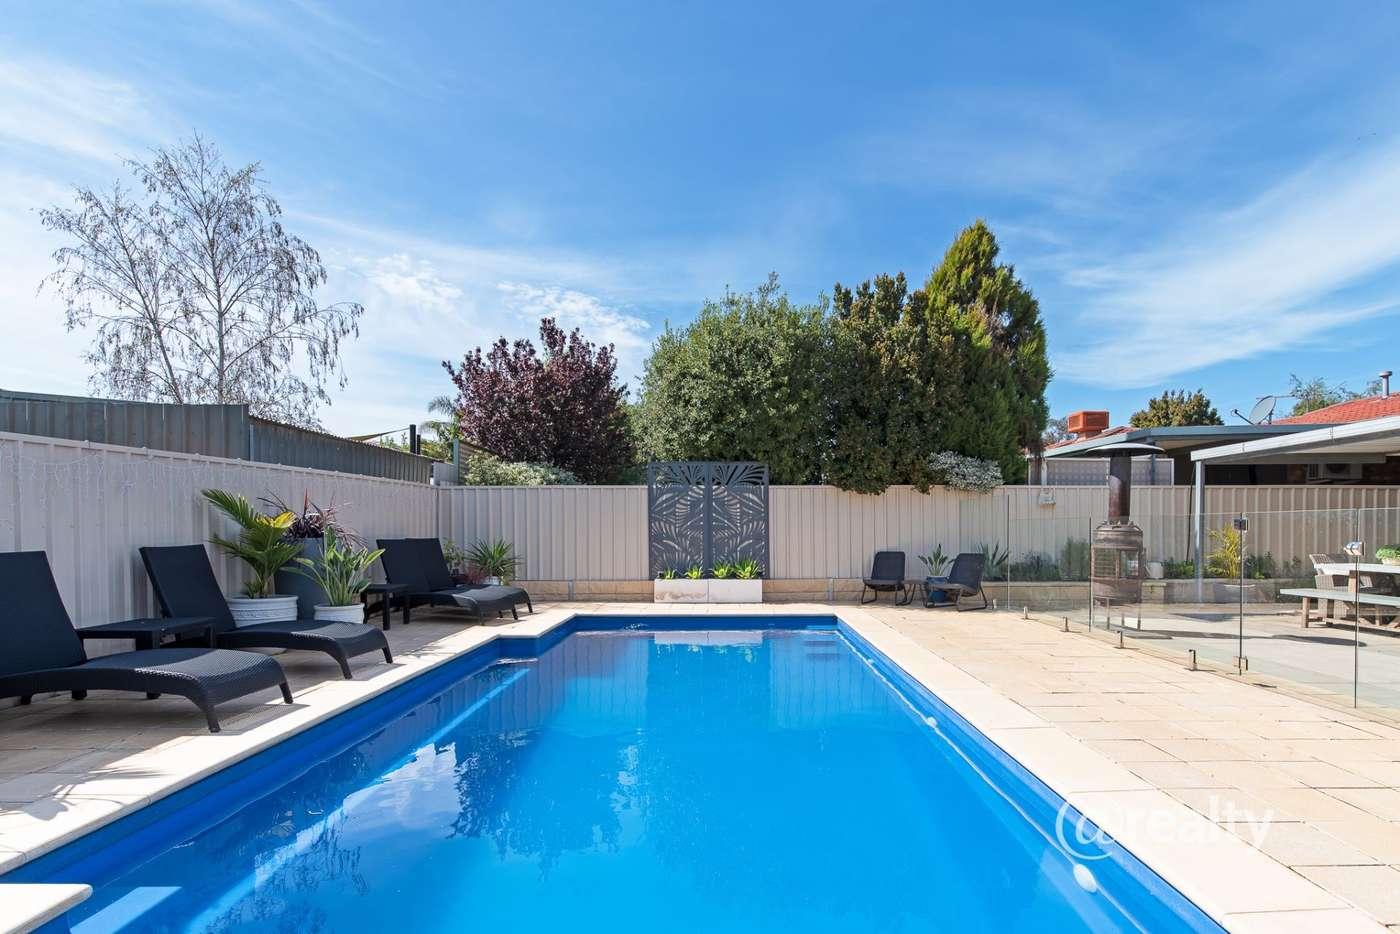 Main view of Homely house listing, 103 Taylors Avenue, Morphett Vale SA 5162